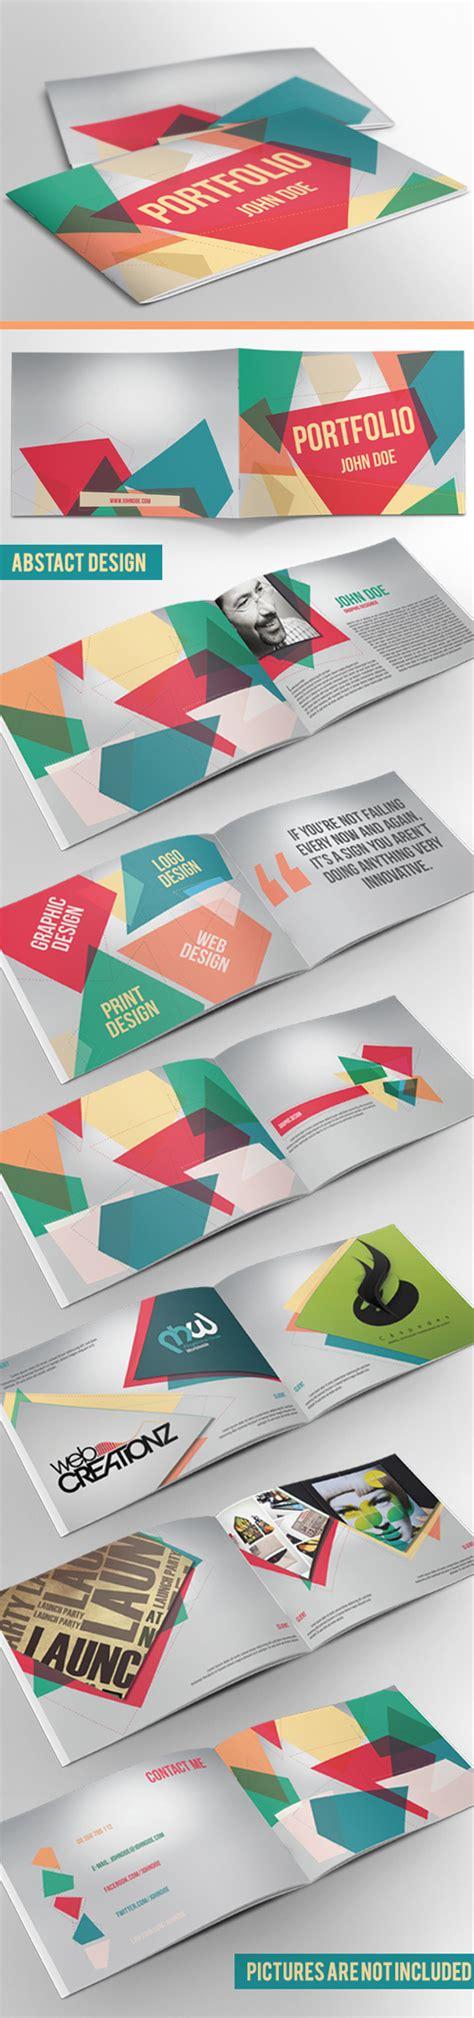 portfolio print template business brochure designs design graphic design junction